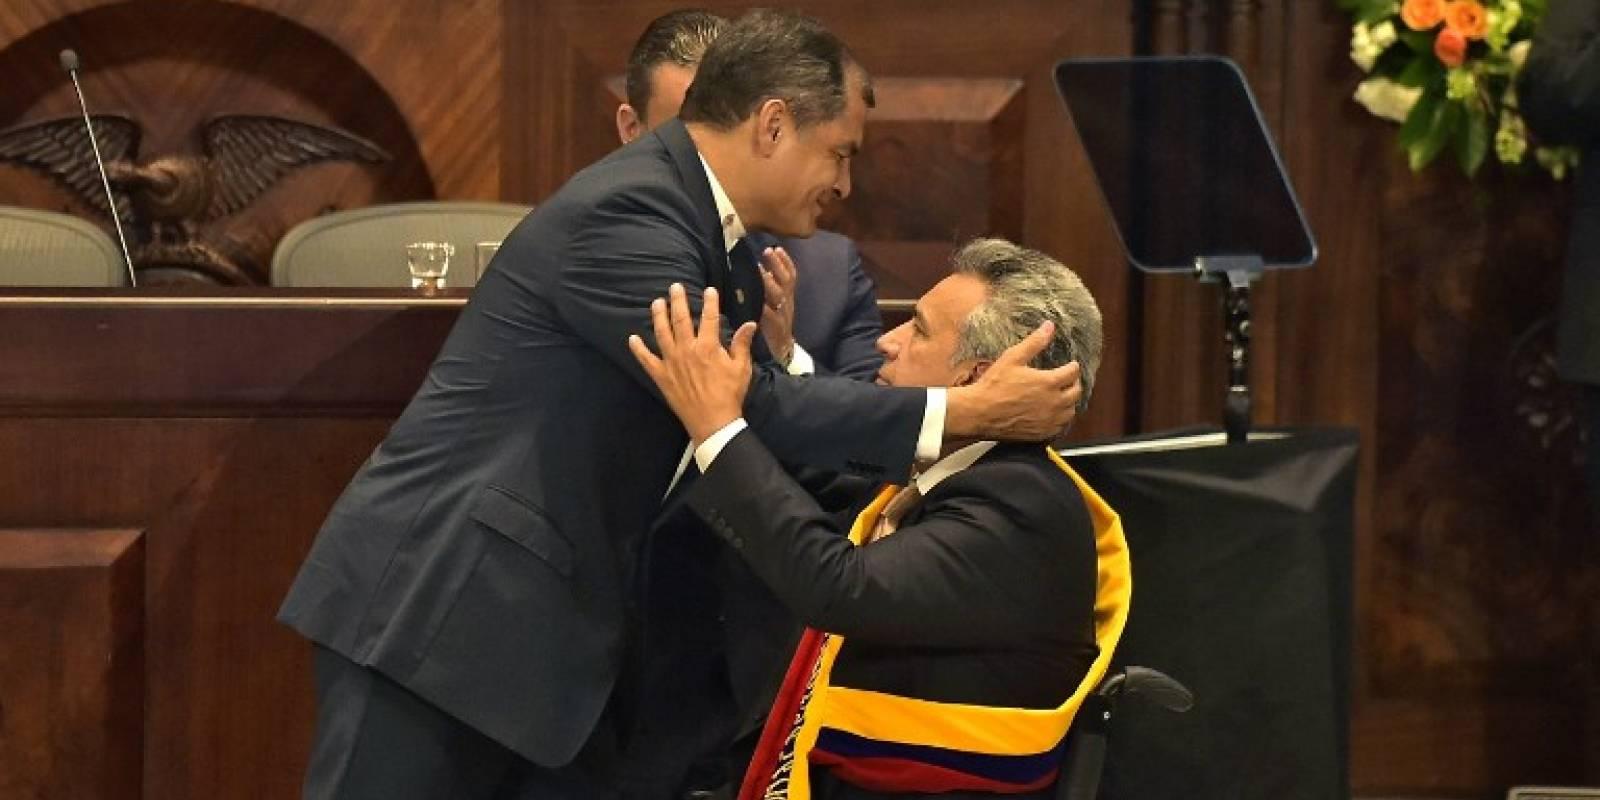 https://media.metrolatam.com/2017/05/24/leninmorenopresidenteecuador2-1600x800.jpg